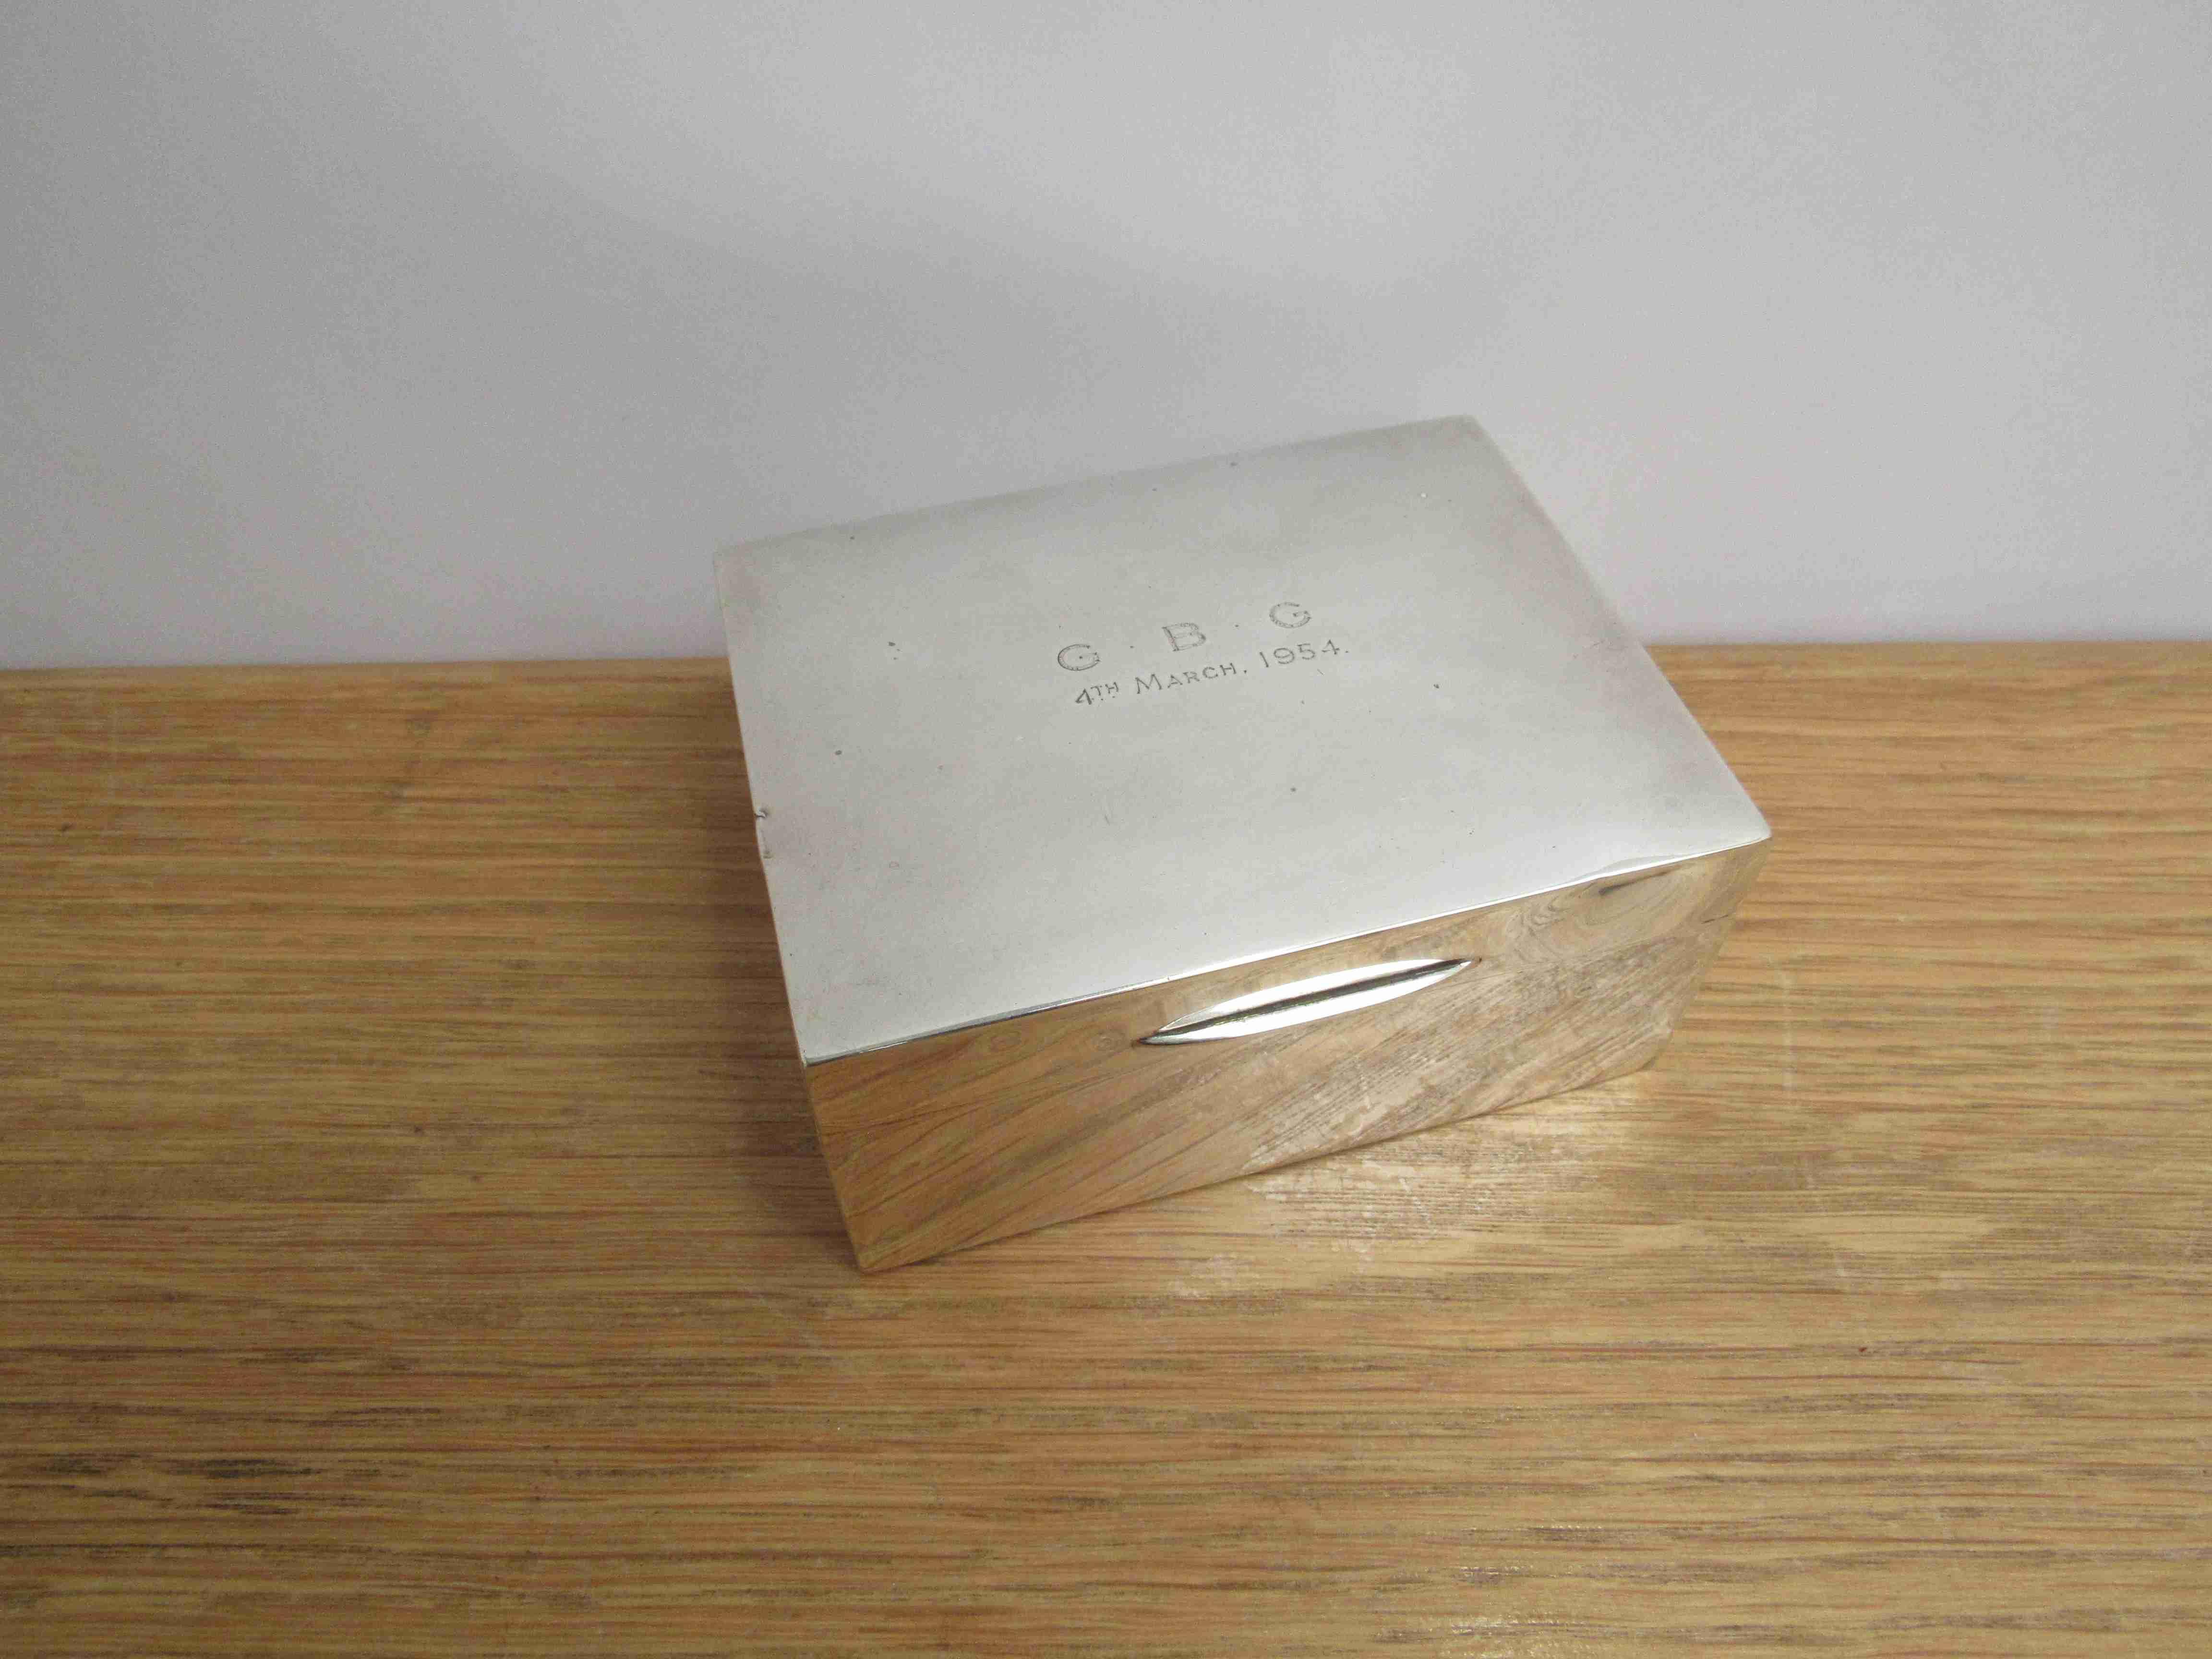 Lot 18 - A William Neale & Son Ltd silver cigarette box, plain form with engraved lid, Birmingham 1953.